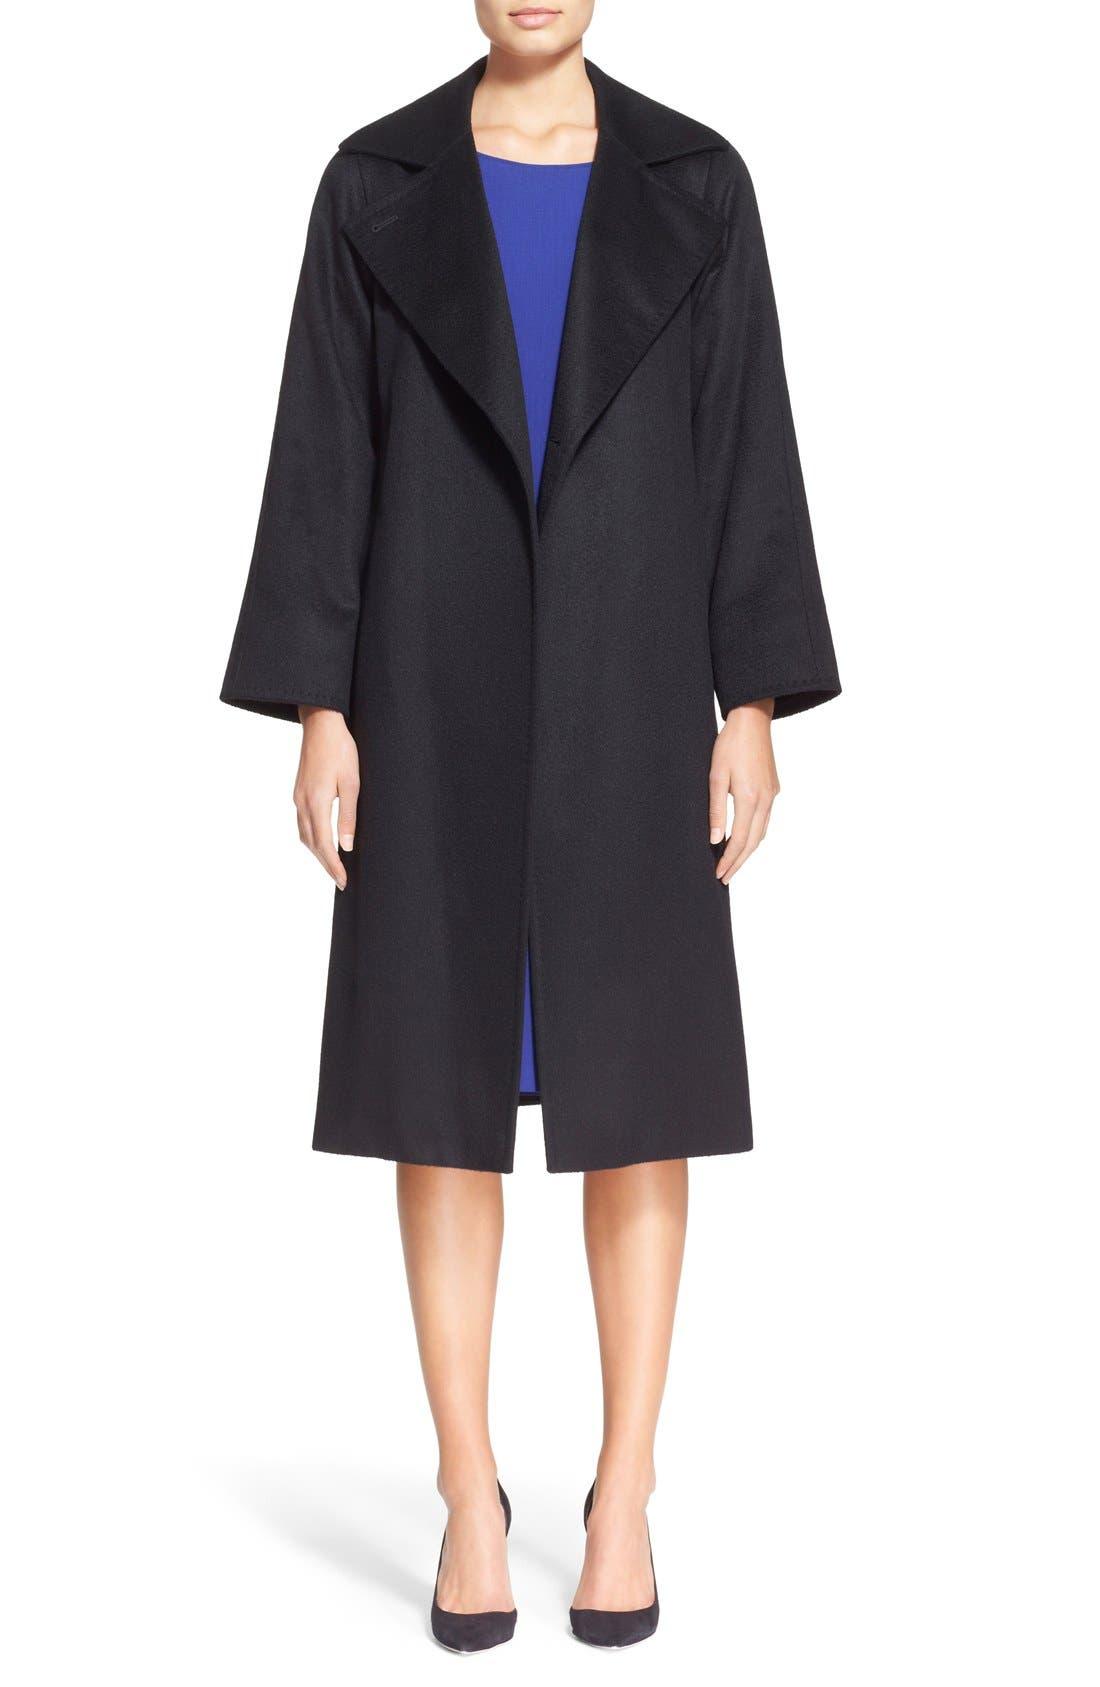 MAX MARA, 'Manuela' Camel Hair Coat, Main thumbnail 1, color, BLACK